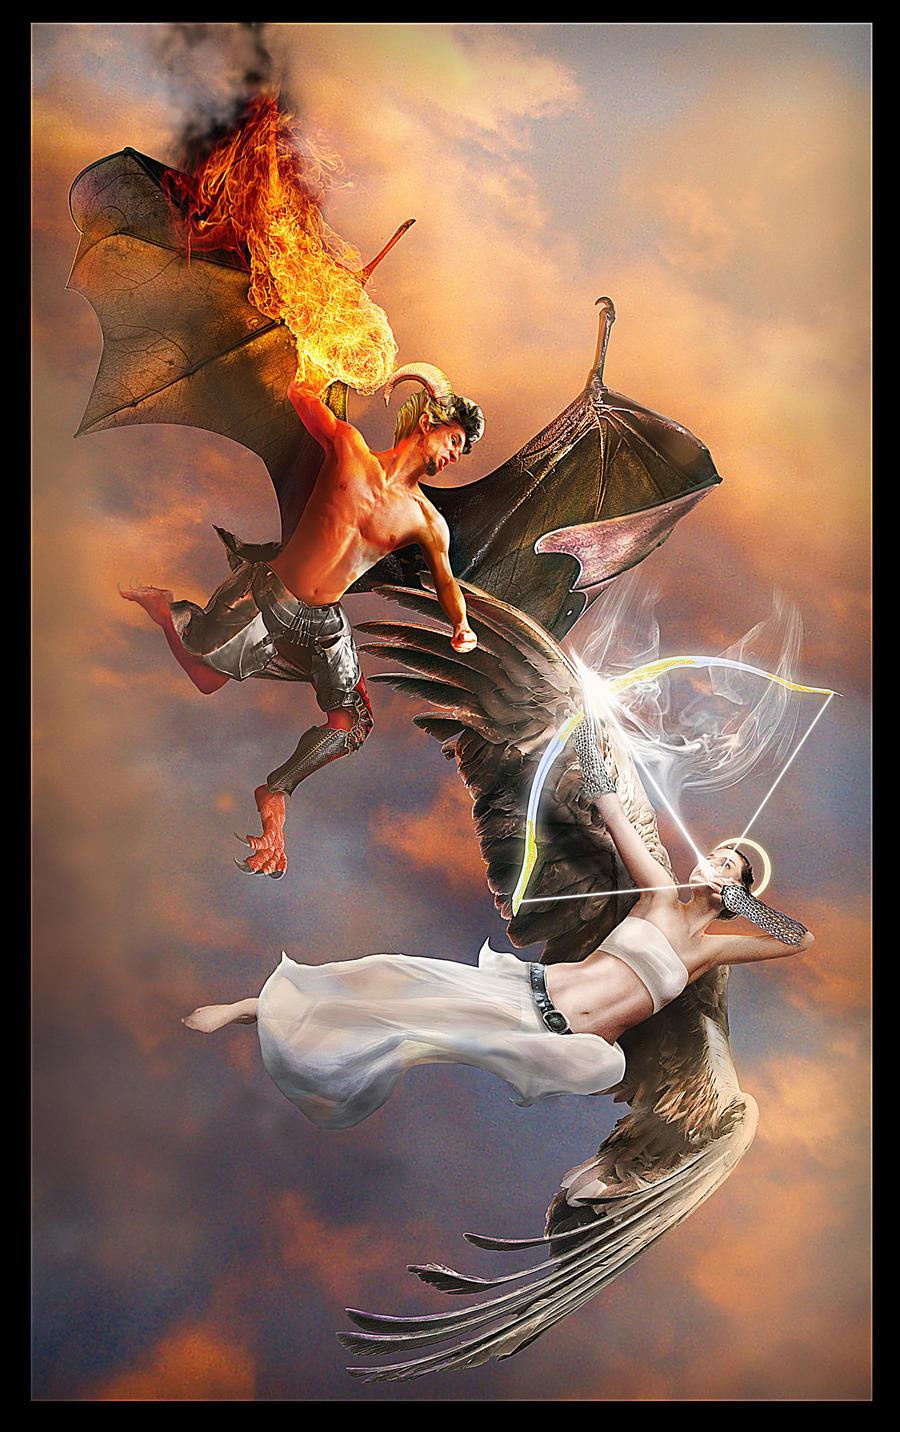 Evil vs. Good by Heat-Phoenix